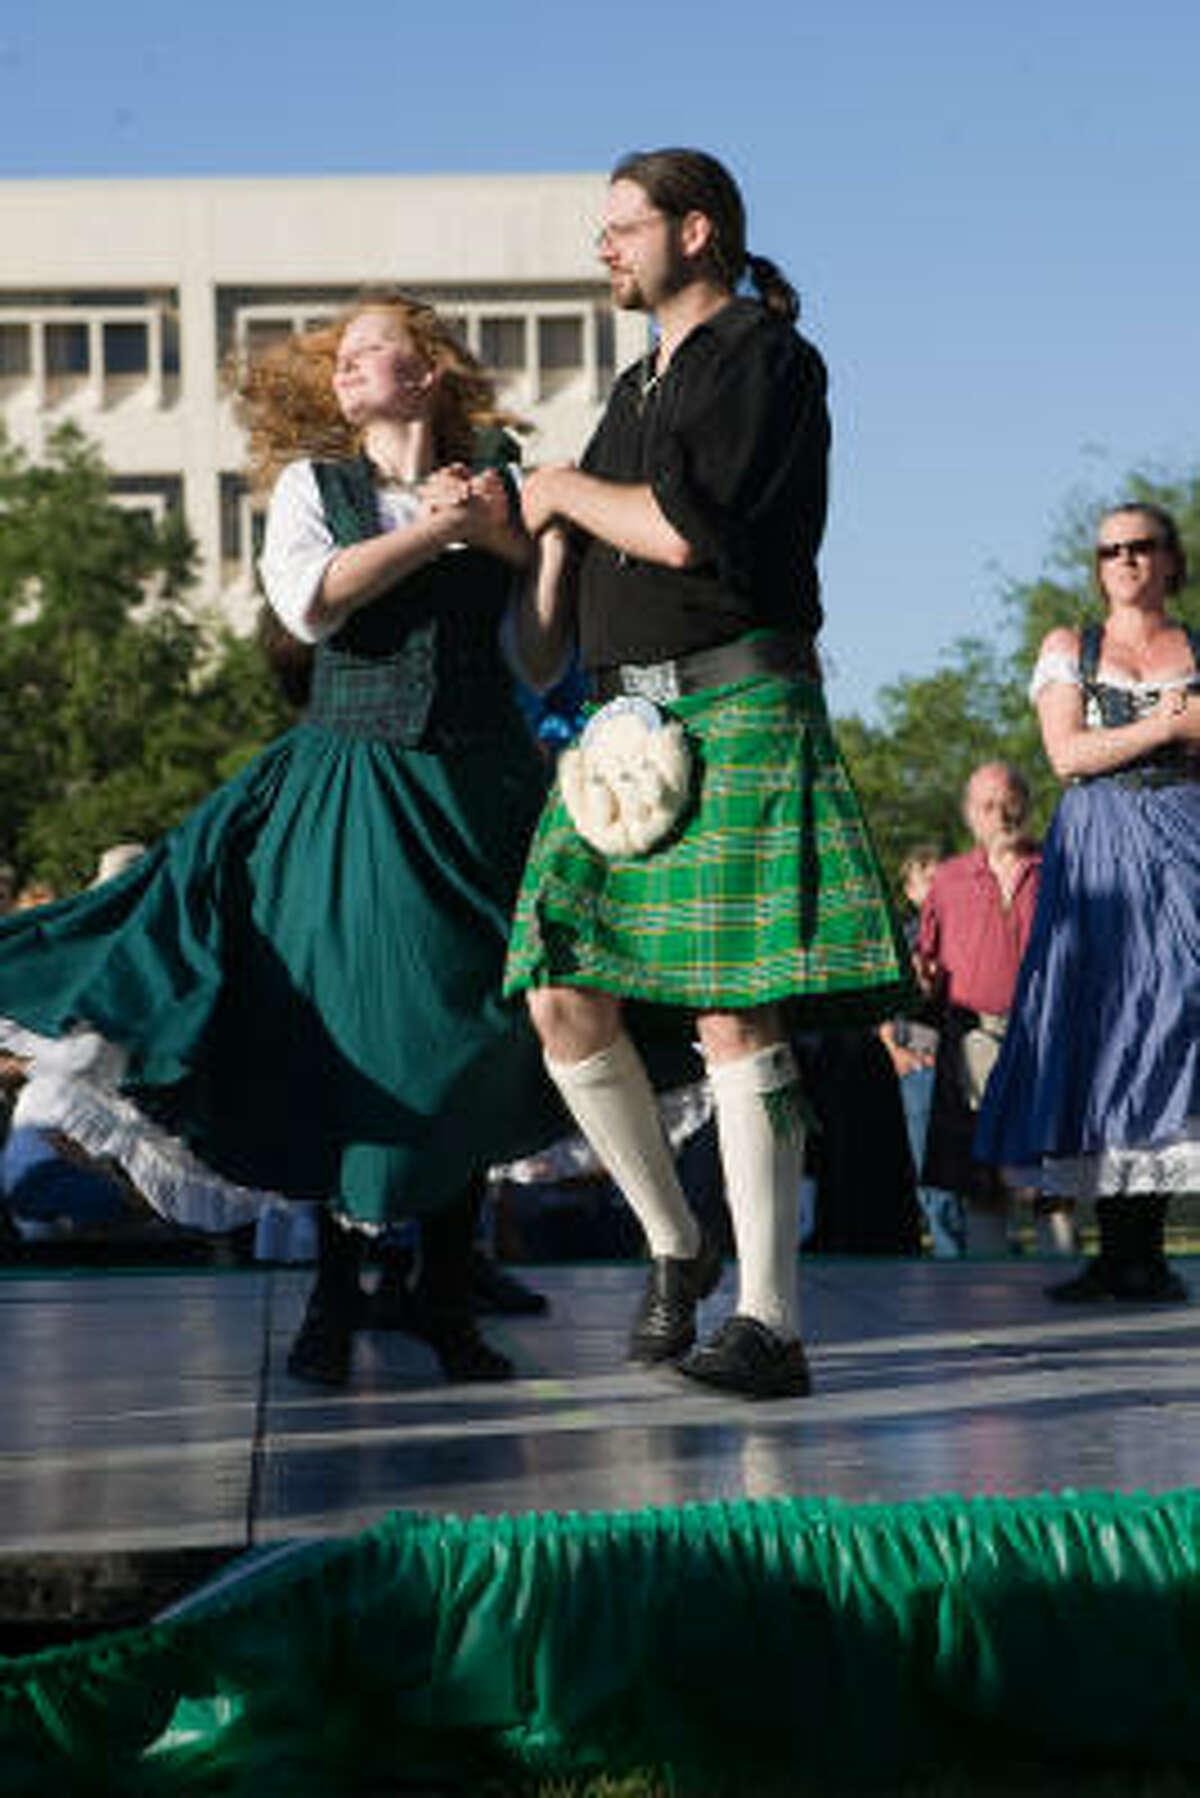 Katherine Crawford and Scott Herrington of Celtic Voyage, from Corpus Christi, perform.